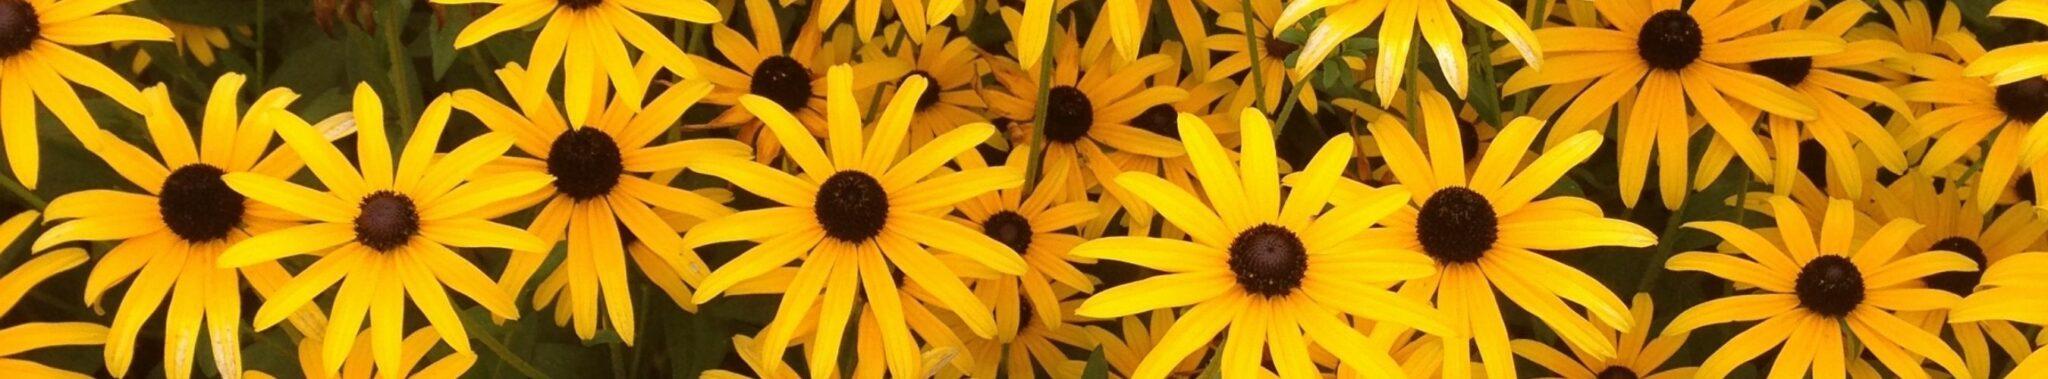 field of yellow flowers rudbeckia black eyed susans